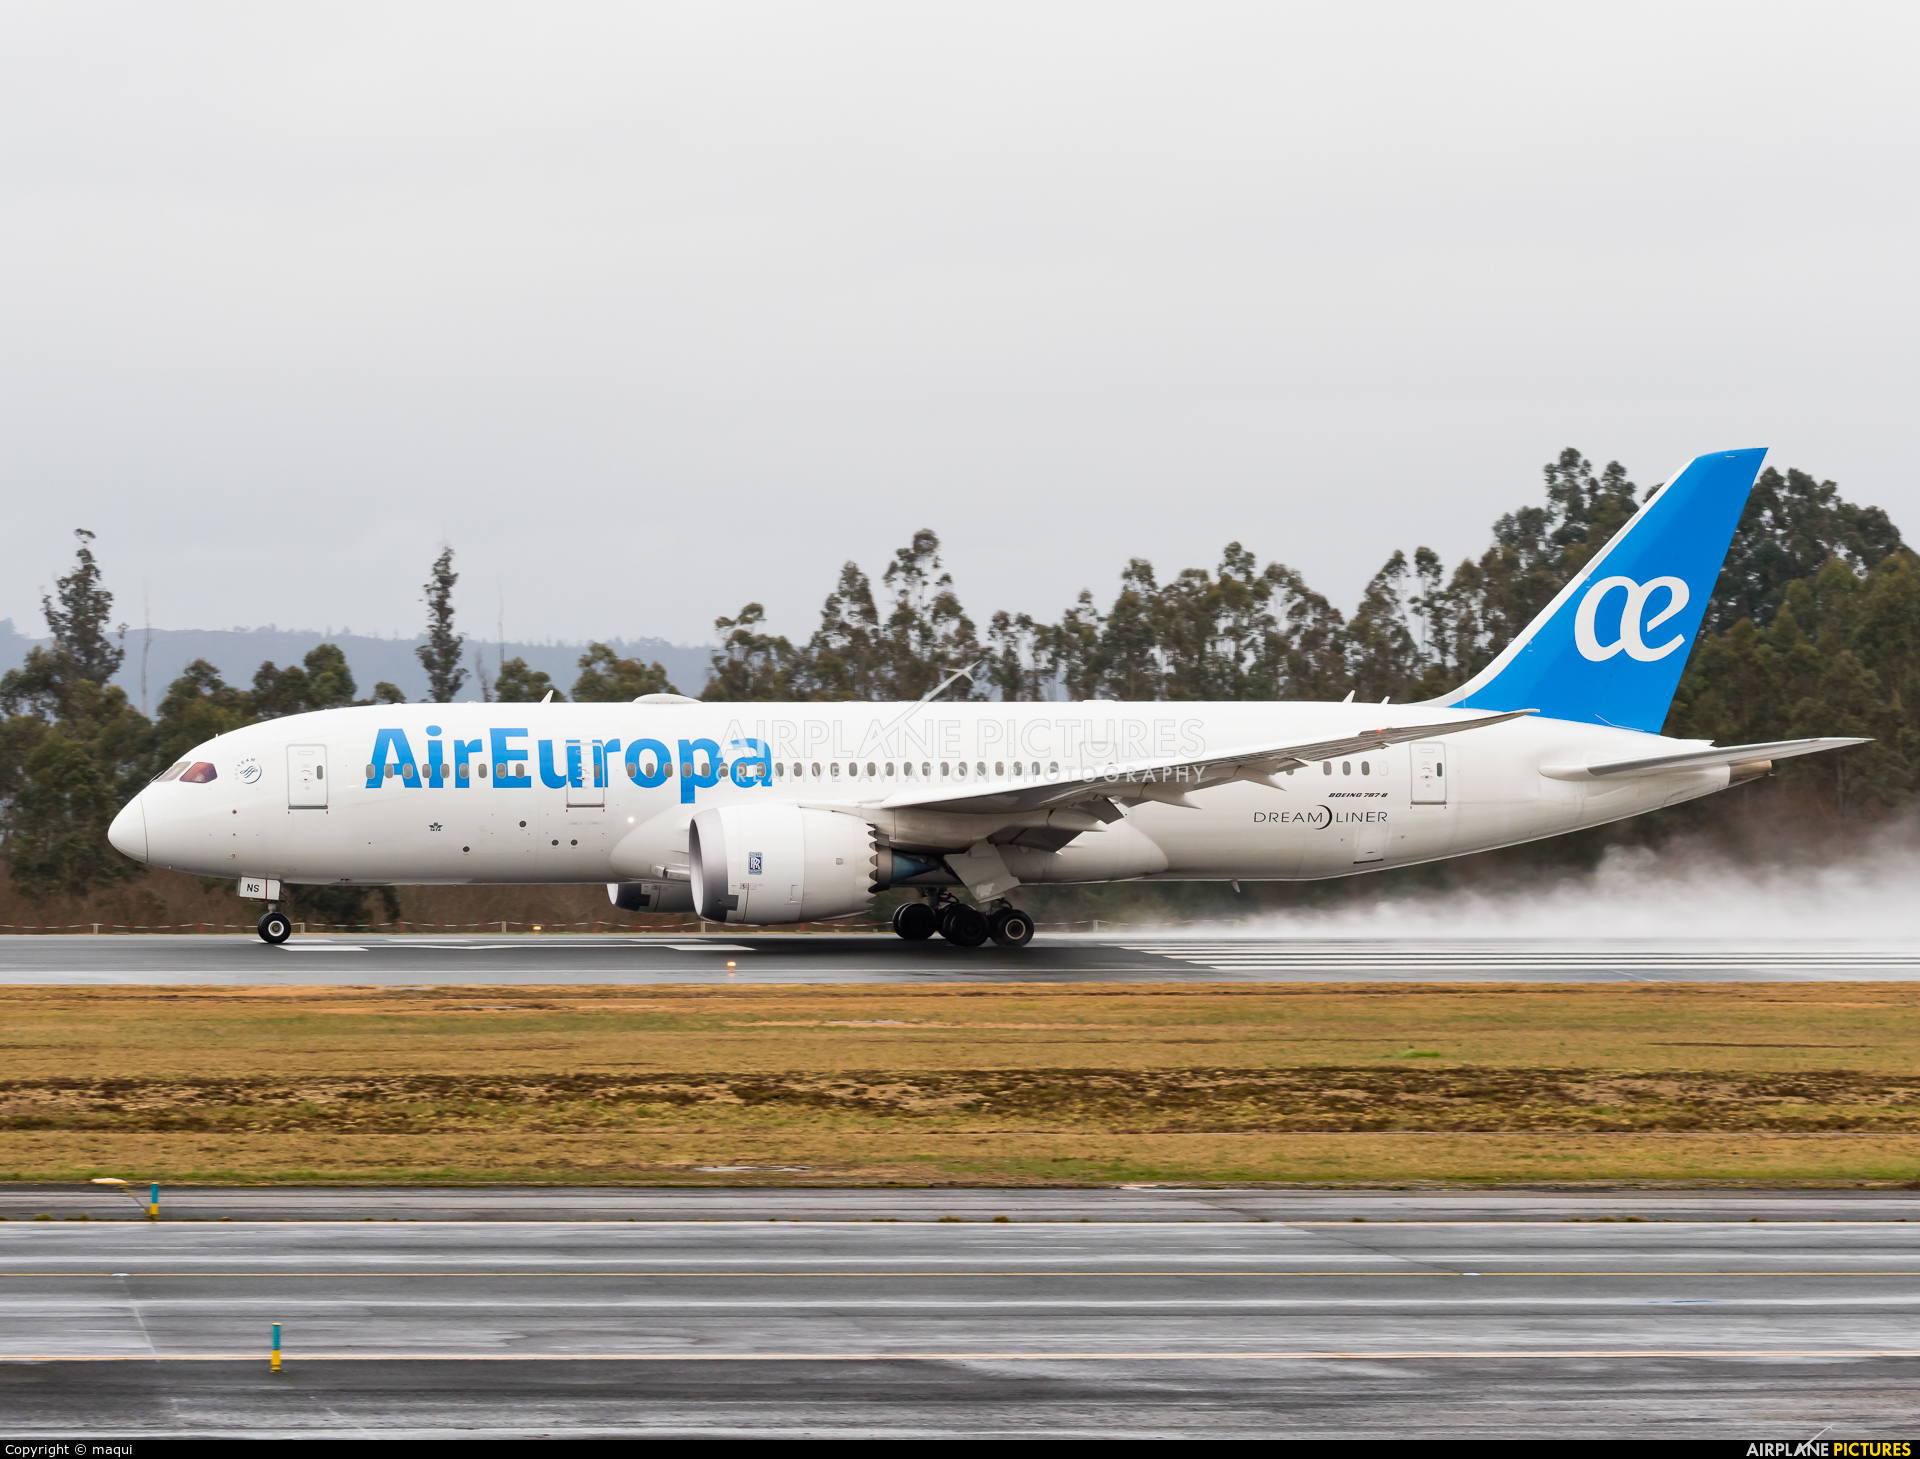 Air Europa EC-MNS aircraft at Santiago de Compostela